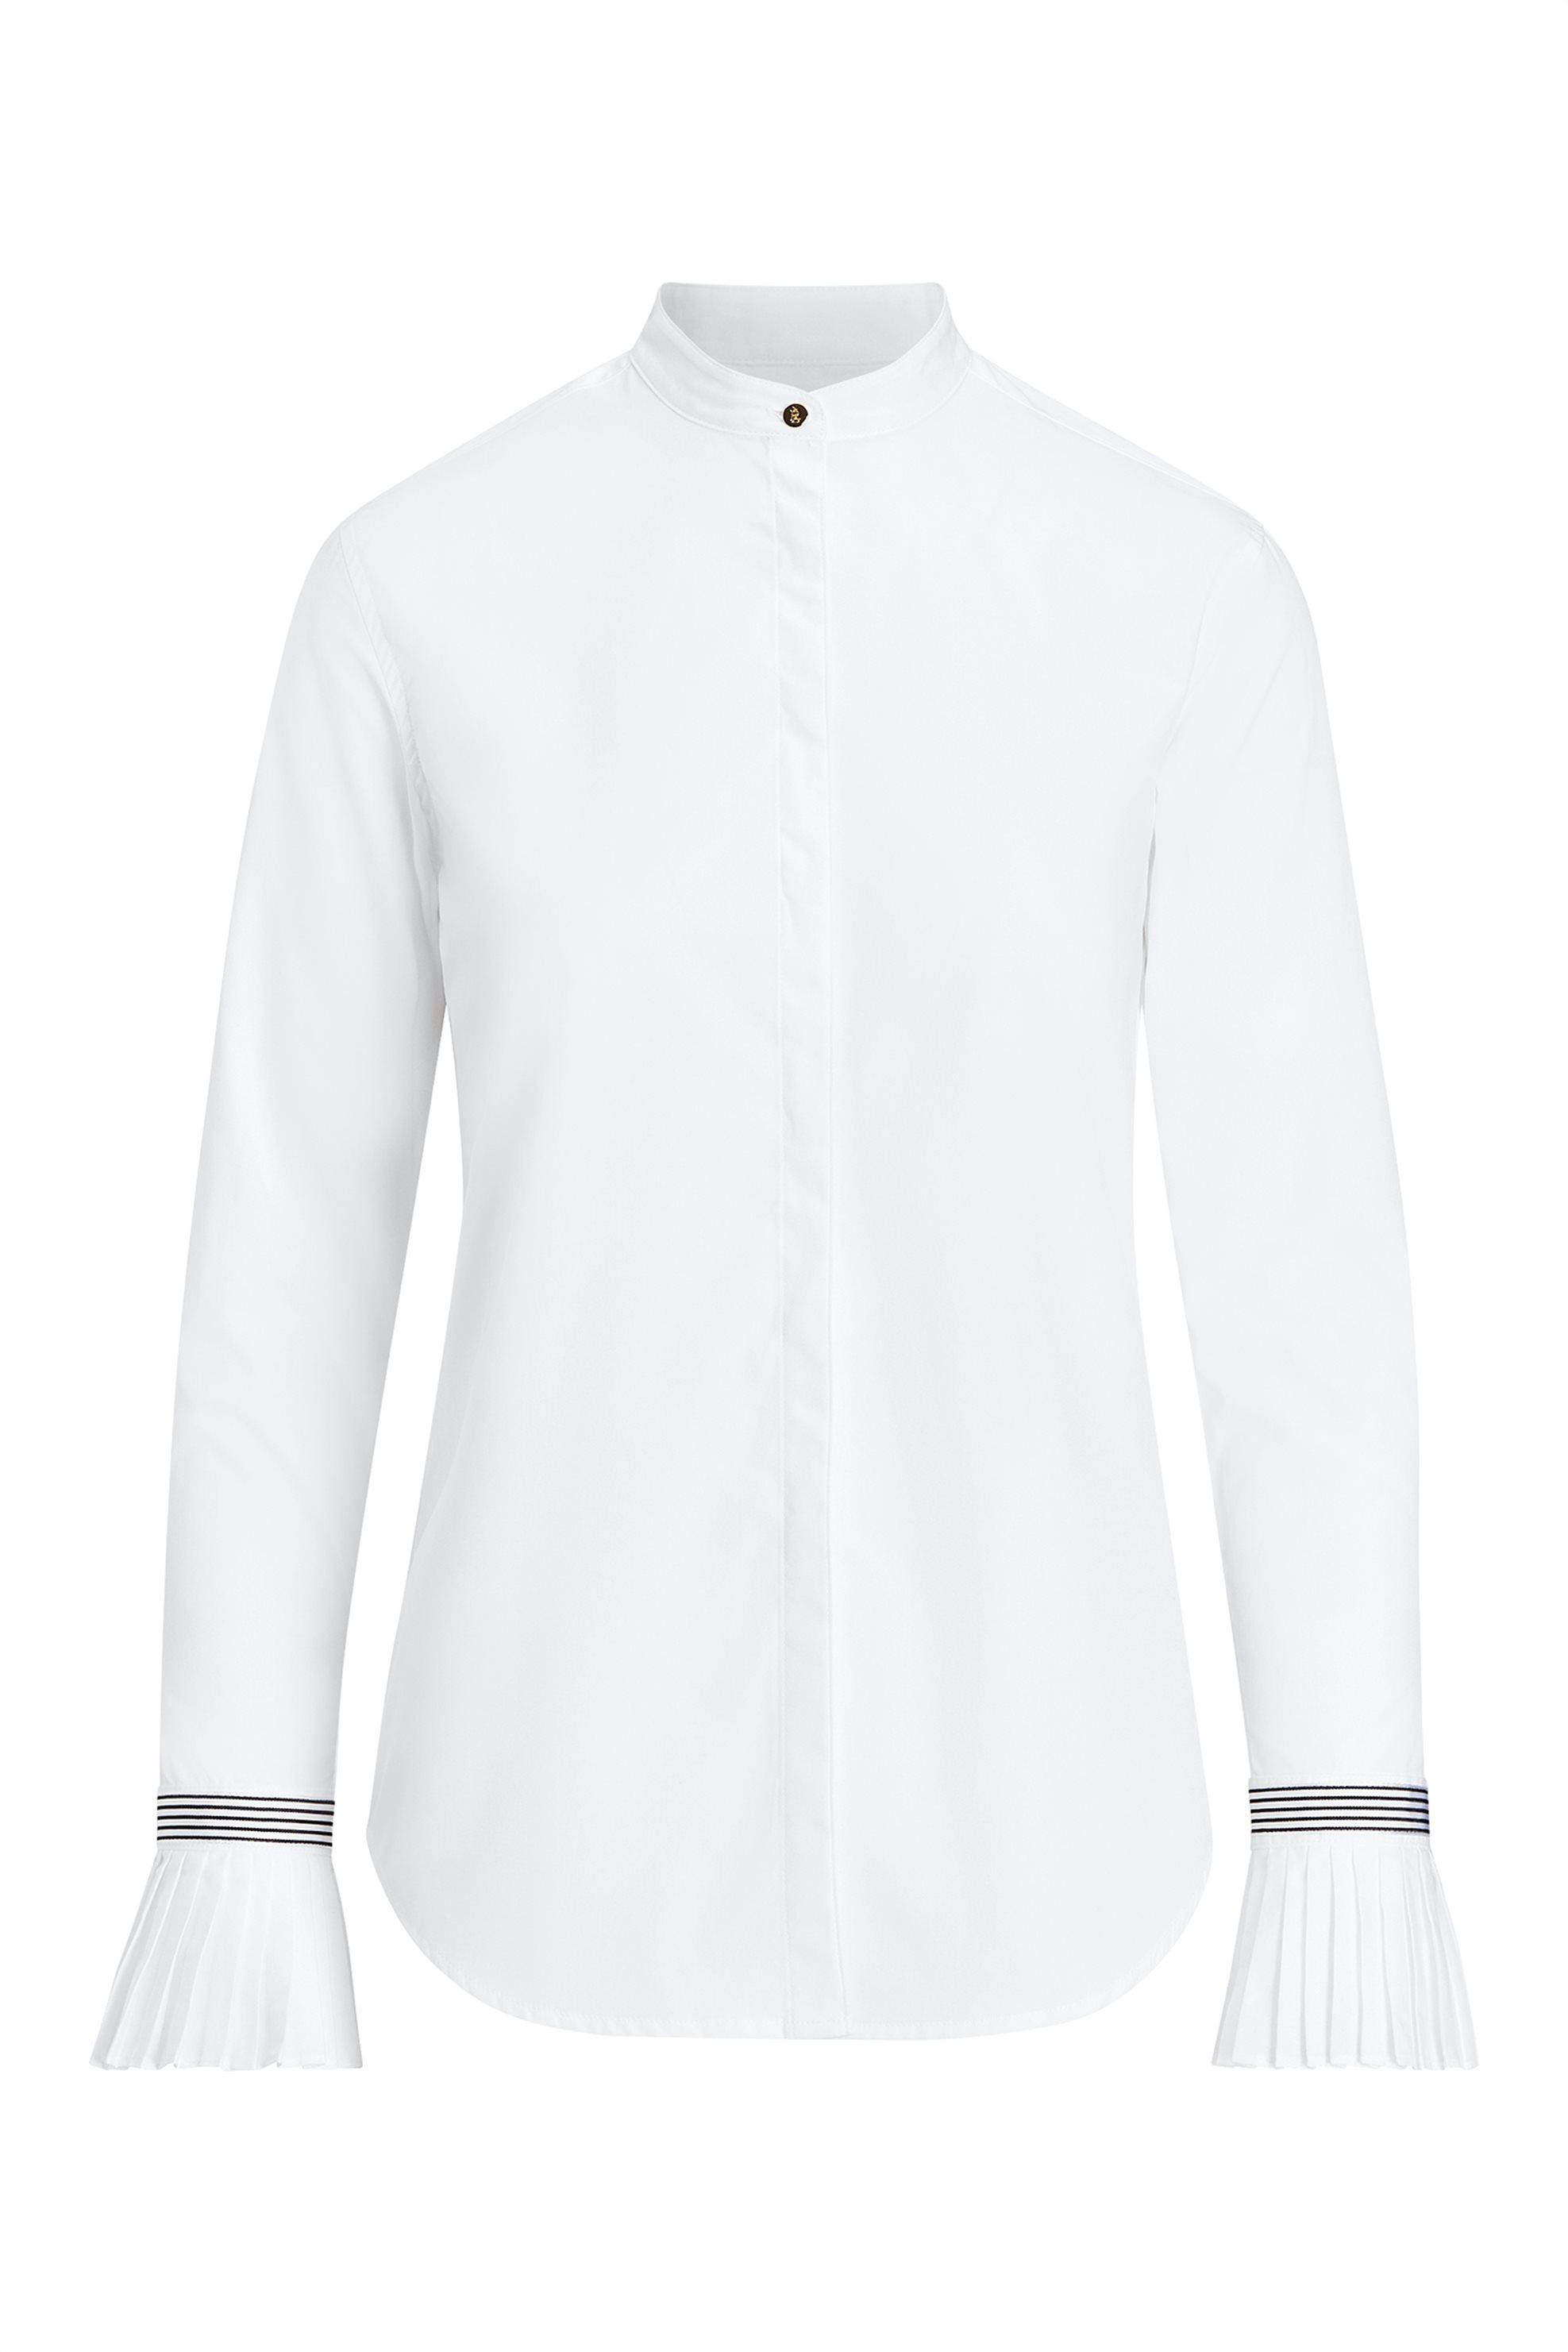 Lauren Ralph Lauren γυναικείo πουκάμισο με πλισέ μανσέτες - 200725871001 - Λευκό γυναικα   ρουχα   tops   πουκάμισα   casual